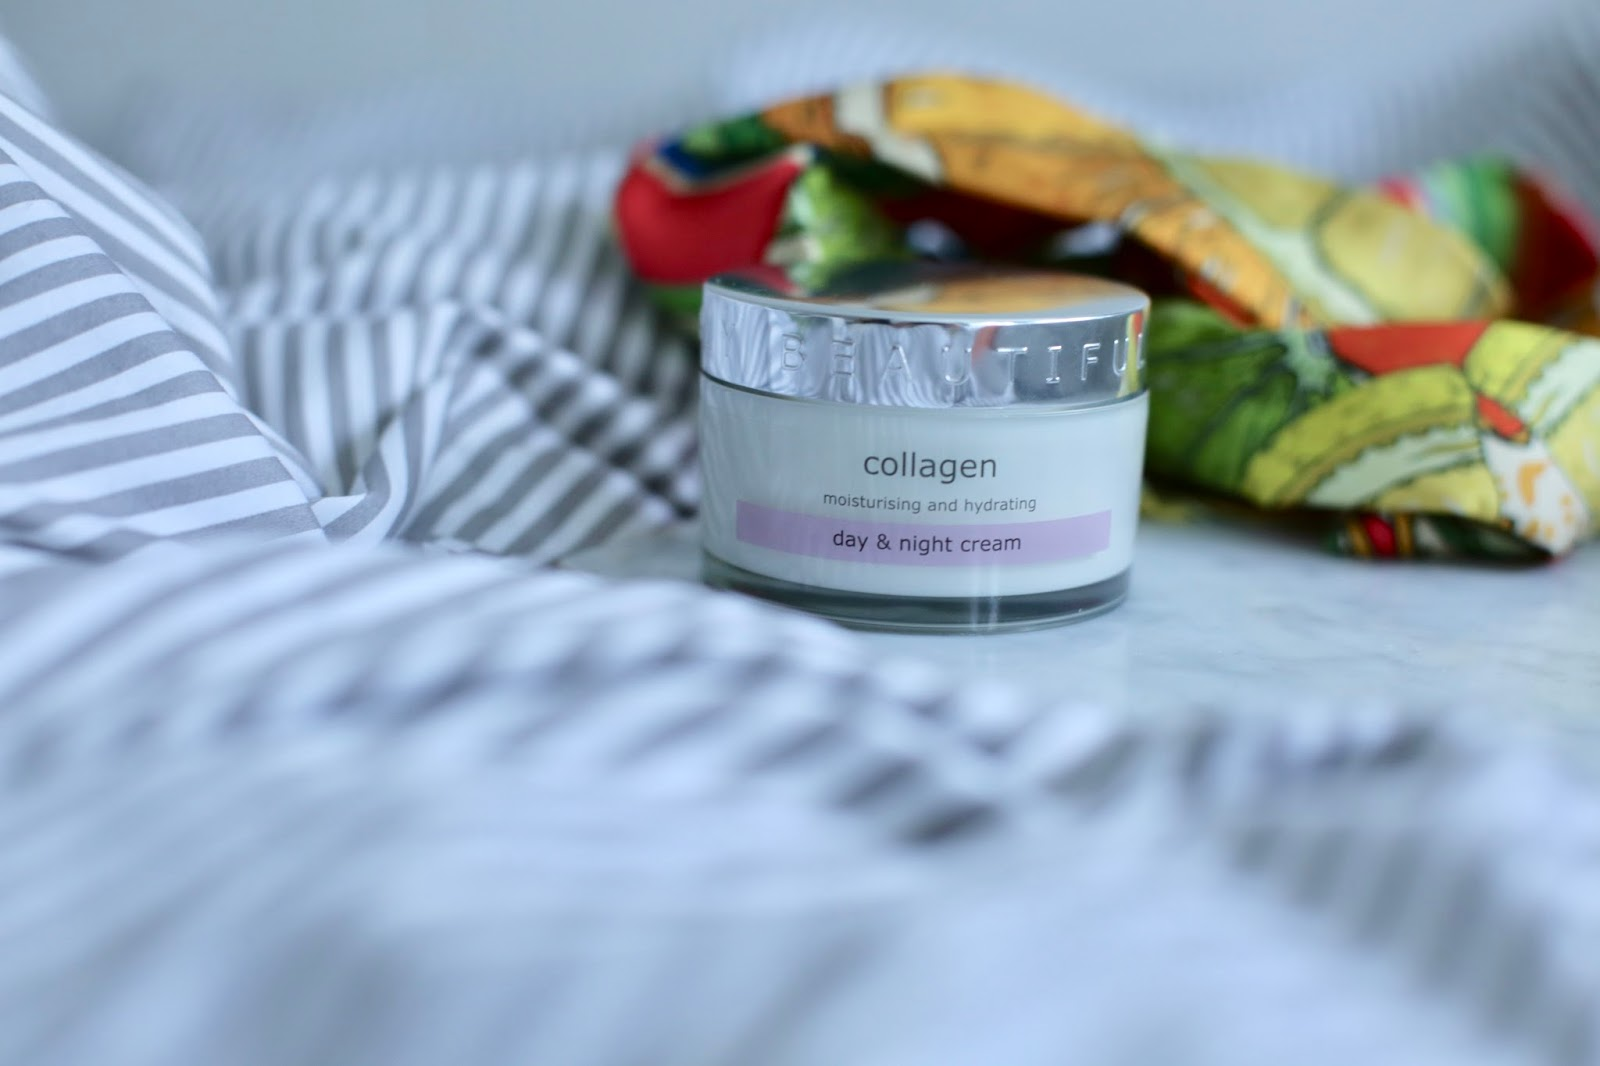 sbc collagen day and night cream